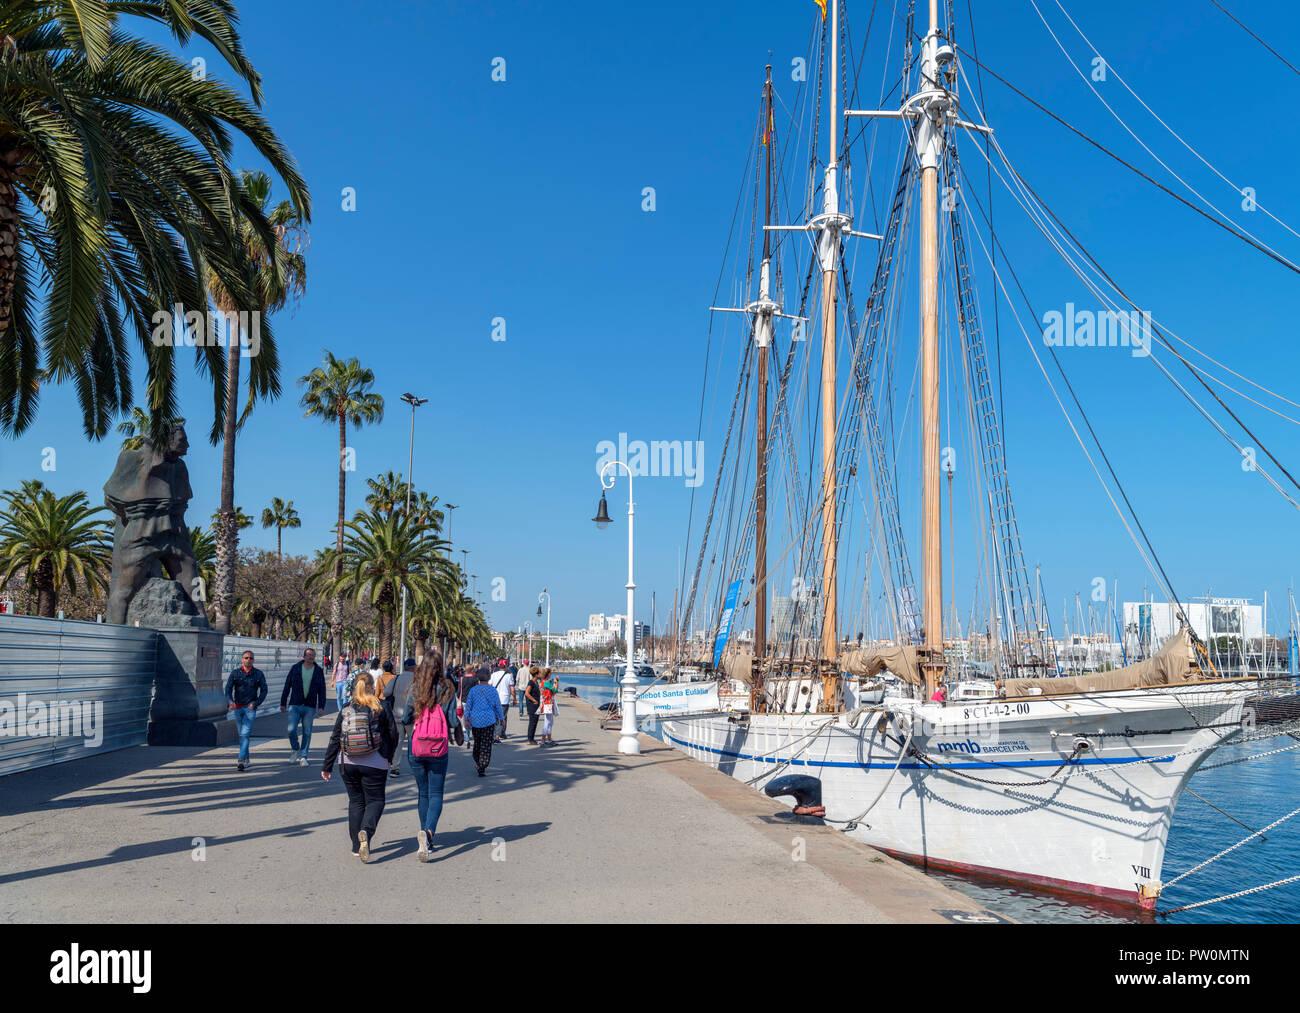 Seafront promenade in the Port Vell (Old Port), Moll de Bosch i Alsina, Barcelona, Spain - Stock Image